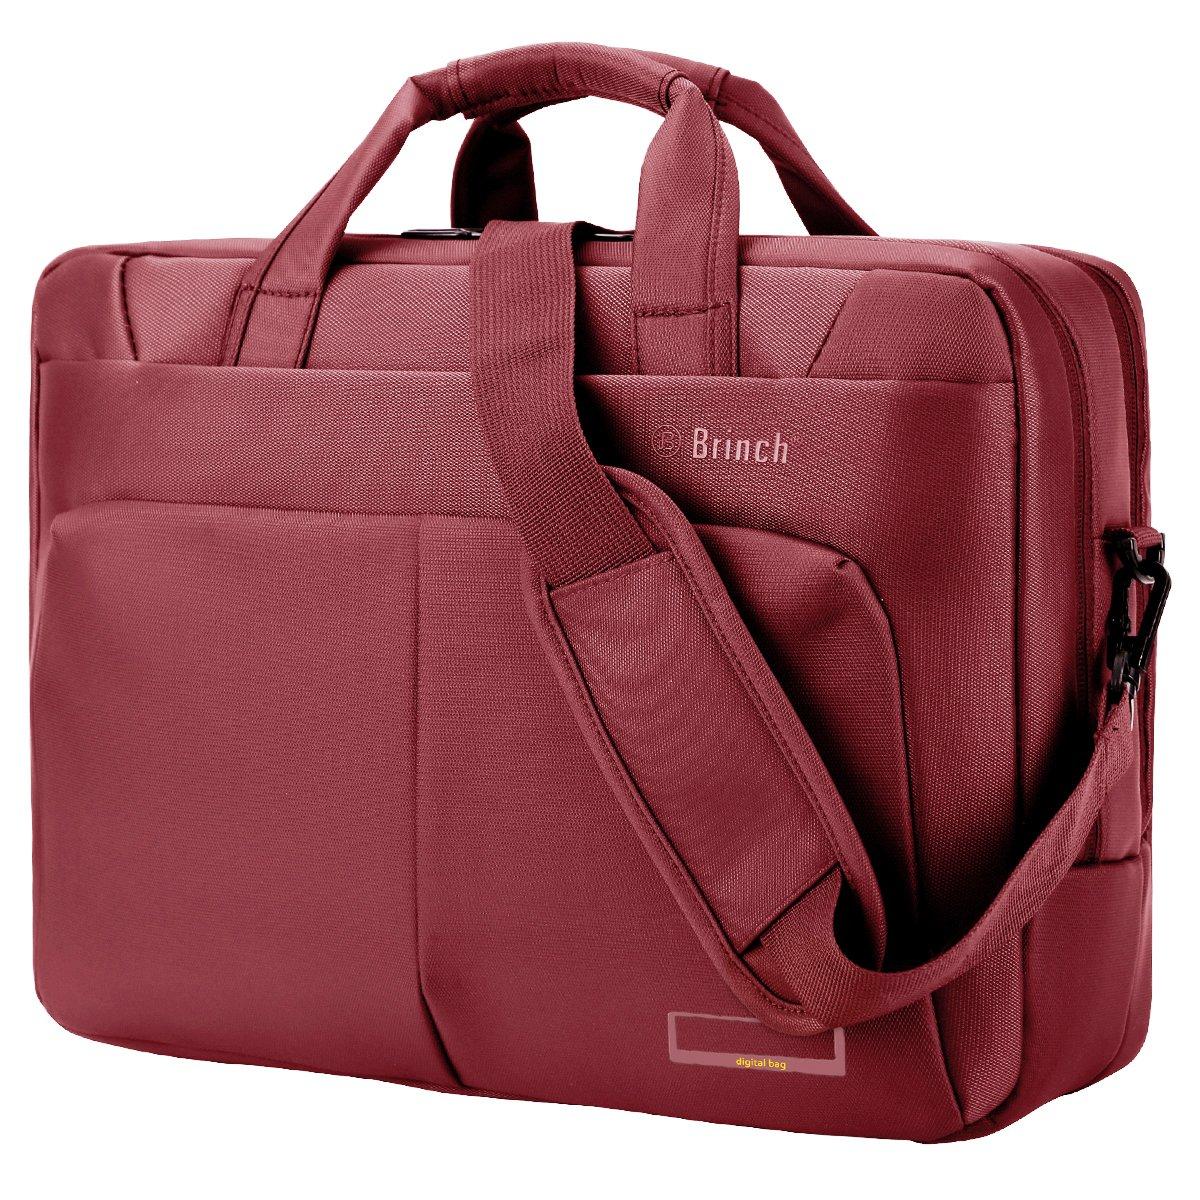 Laptop Bag Briefcase, BRINCH 15.6 inch Stylish Roomy Multi-Compartment Laptop Shoulder Messenger Bag Business Travel Briefcase for Men/Women Fits 15-15.6 inch Laptop/Notebook Computers,Black